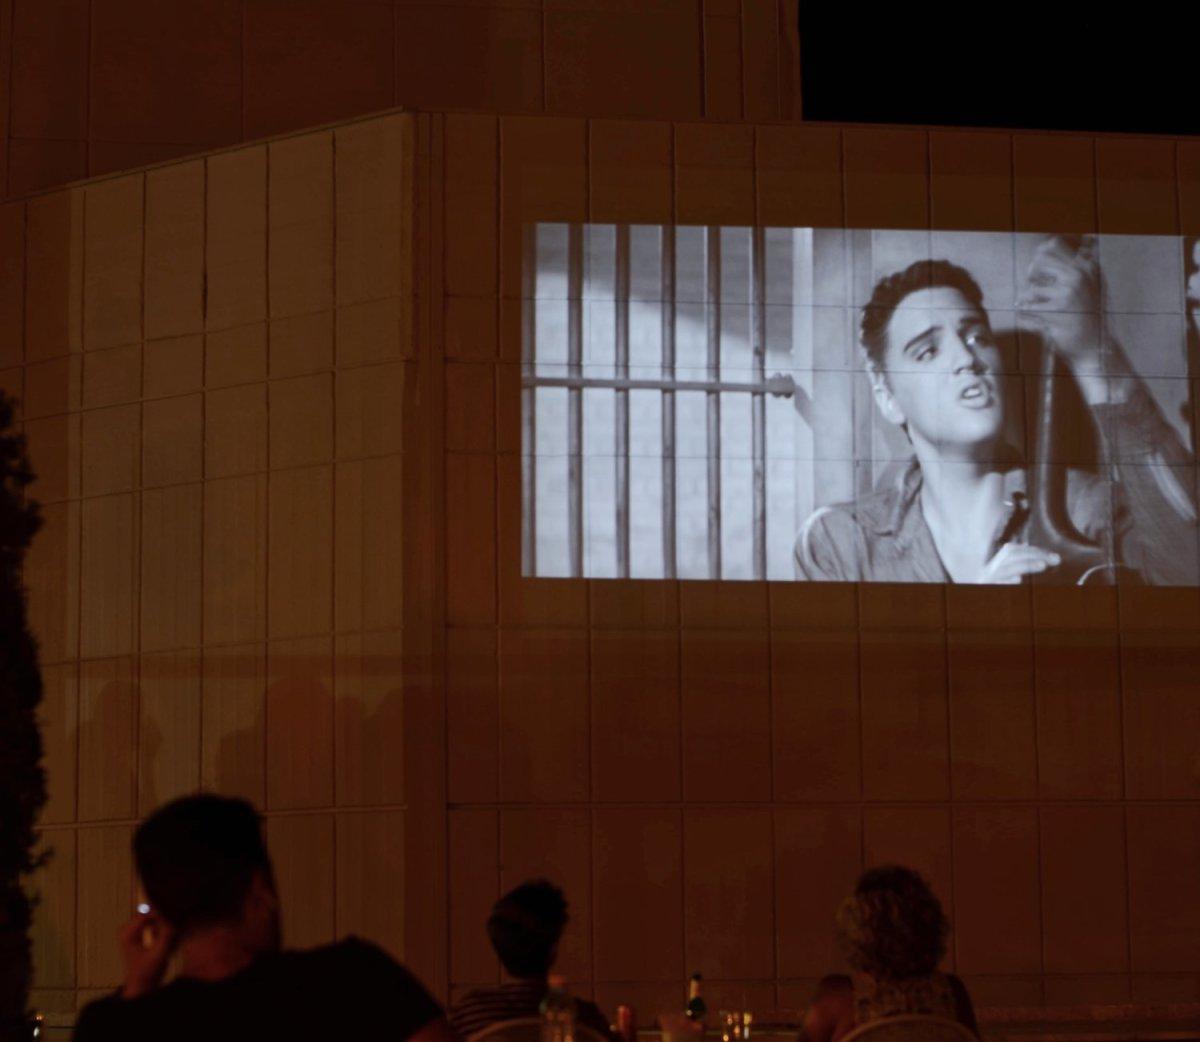 Retro Cinema στο Playhouse Atelier στη Δημοτική Πινακοθήκη Λάρισας